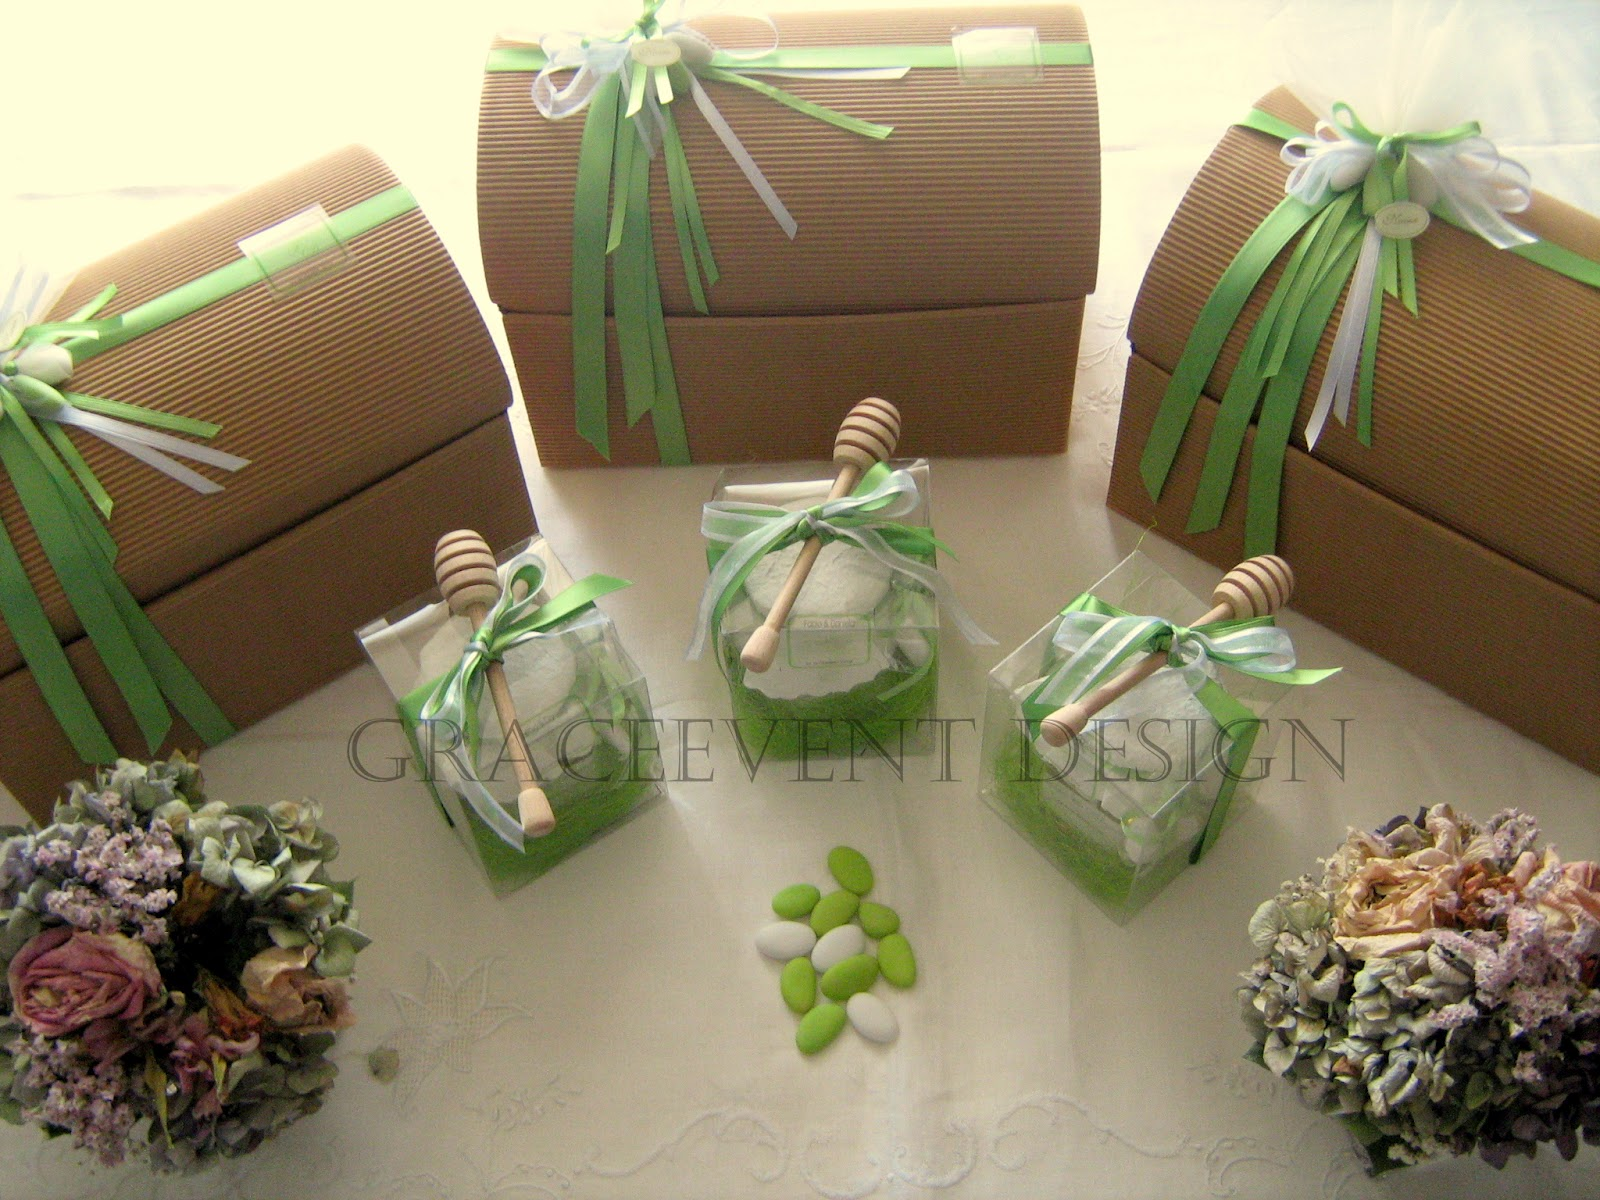 Matrimonio Tema Verde : Nozzeeventi bio ed eco chic matrimonio verde mela dalla